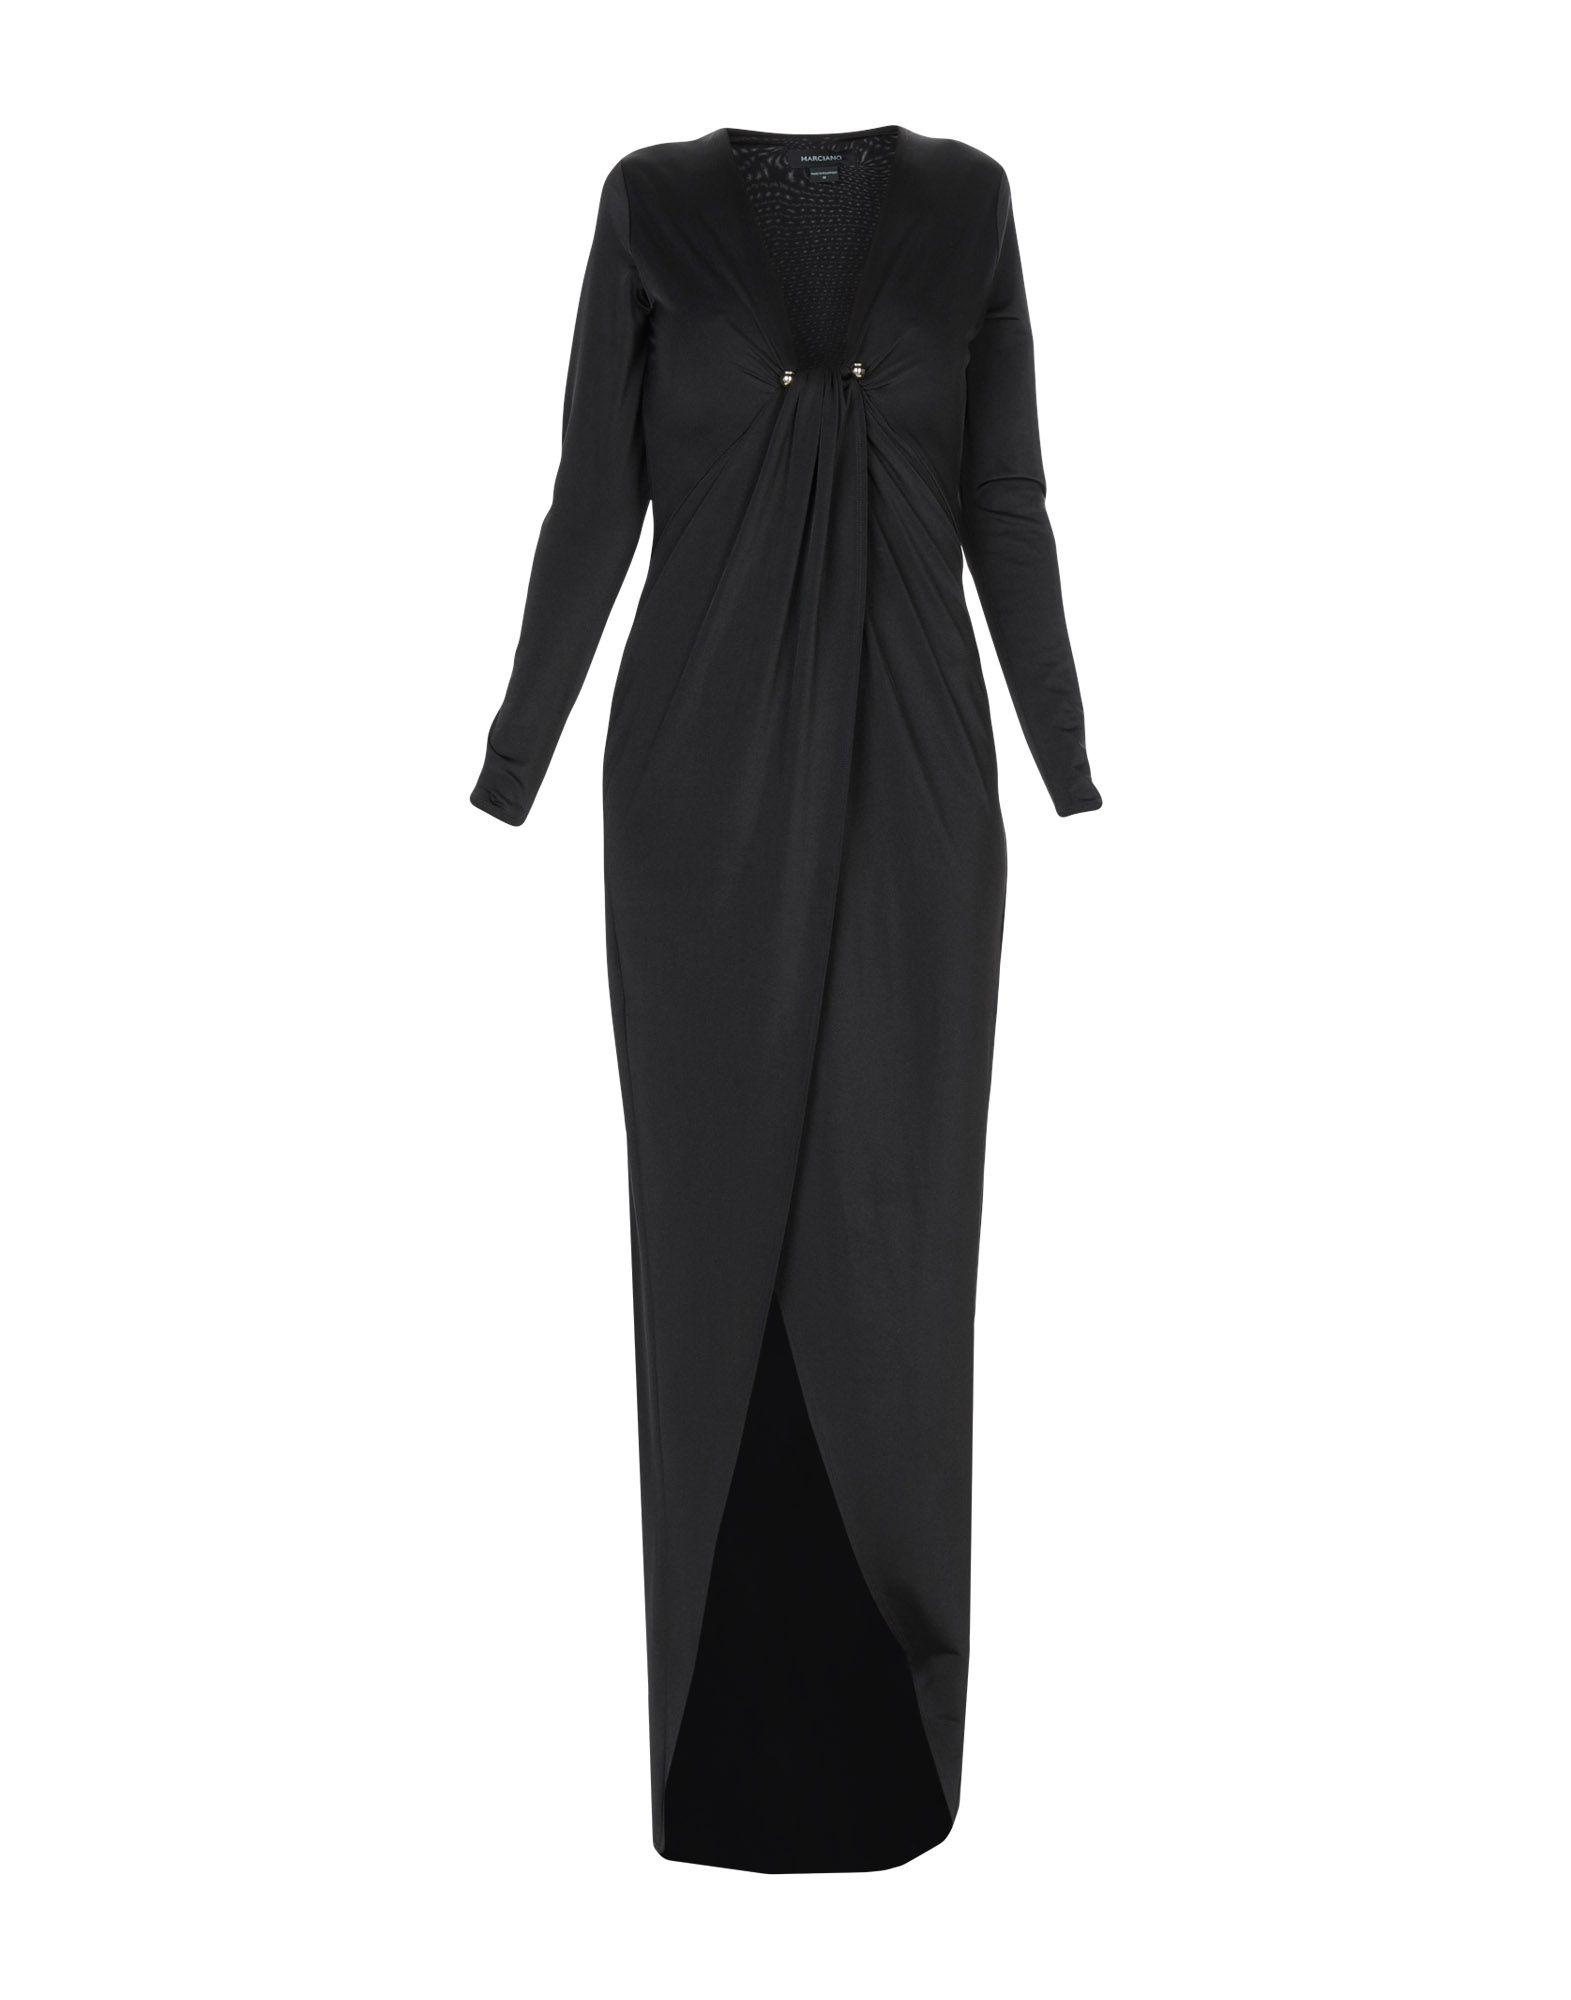 GUESS BY MARCIANO Длинное платье платье marciano guess 71g746 8220z a996